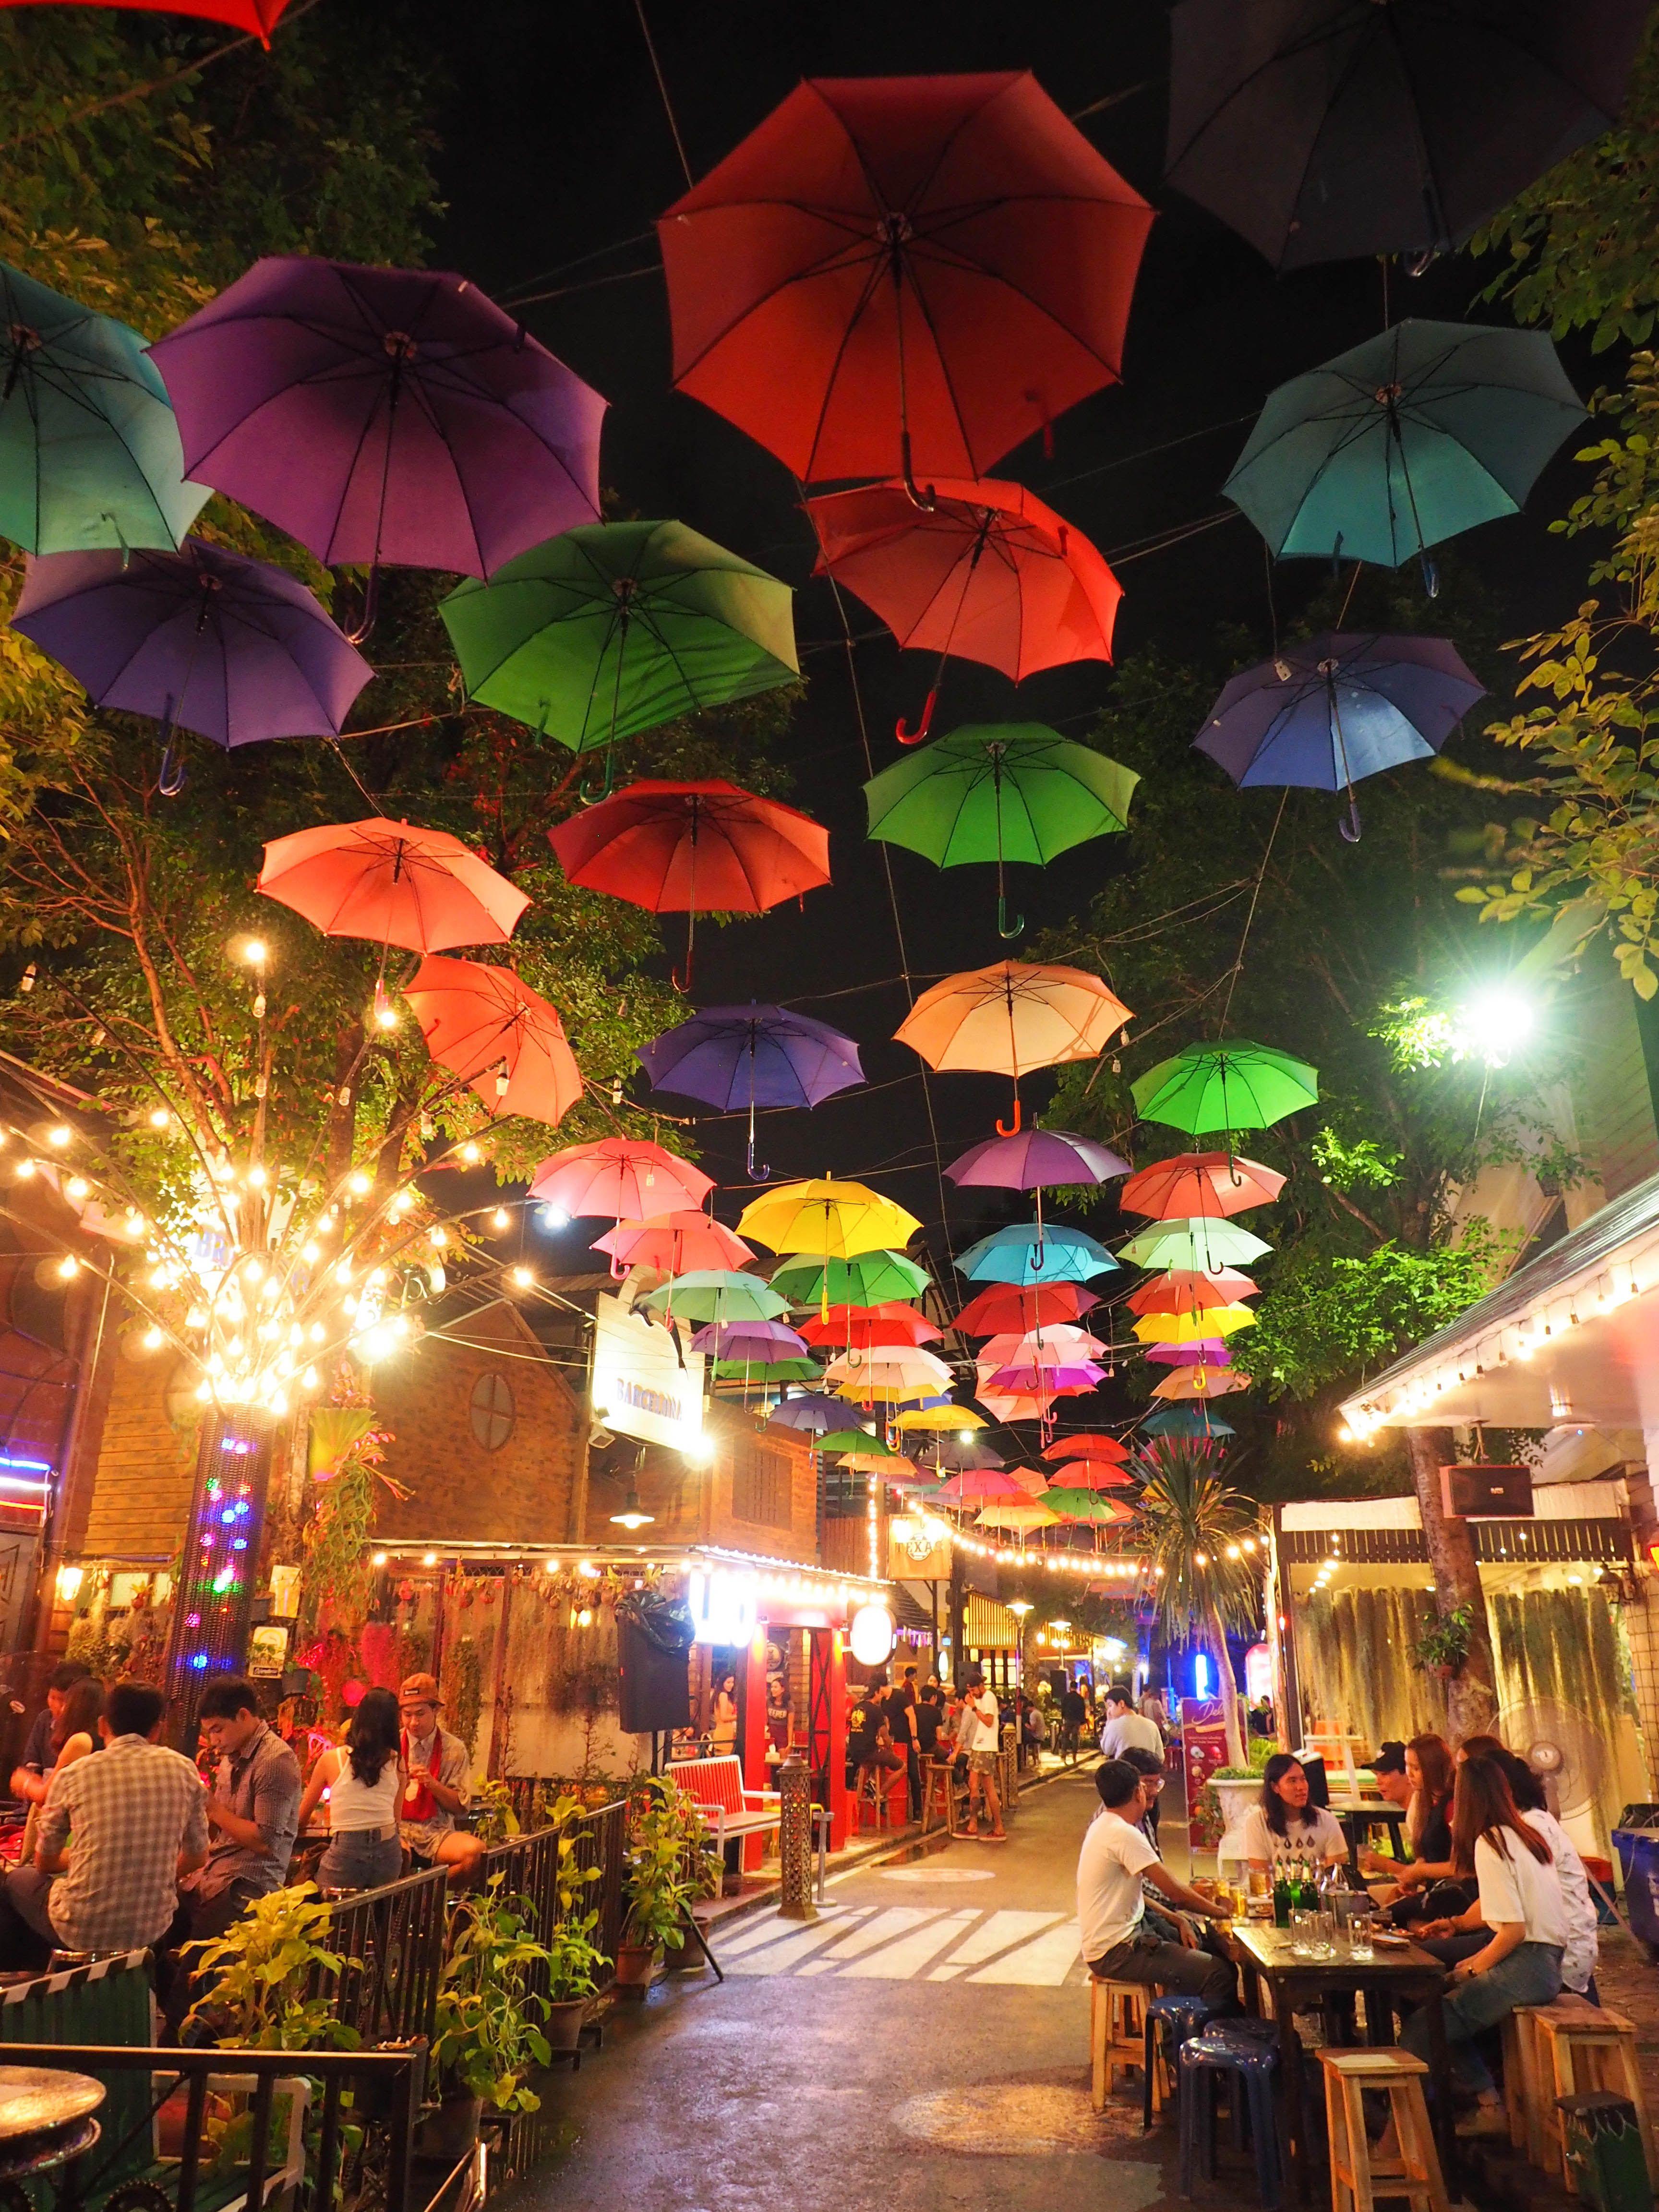 86ed067c10 Colourful hanging umbrellas in Chiang Mai